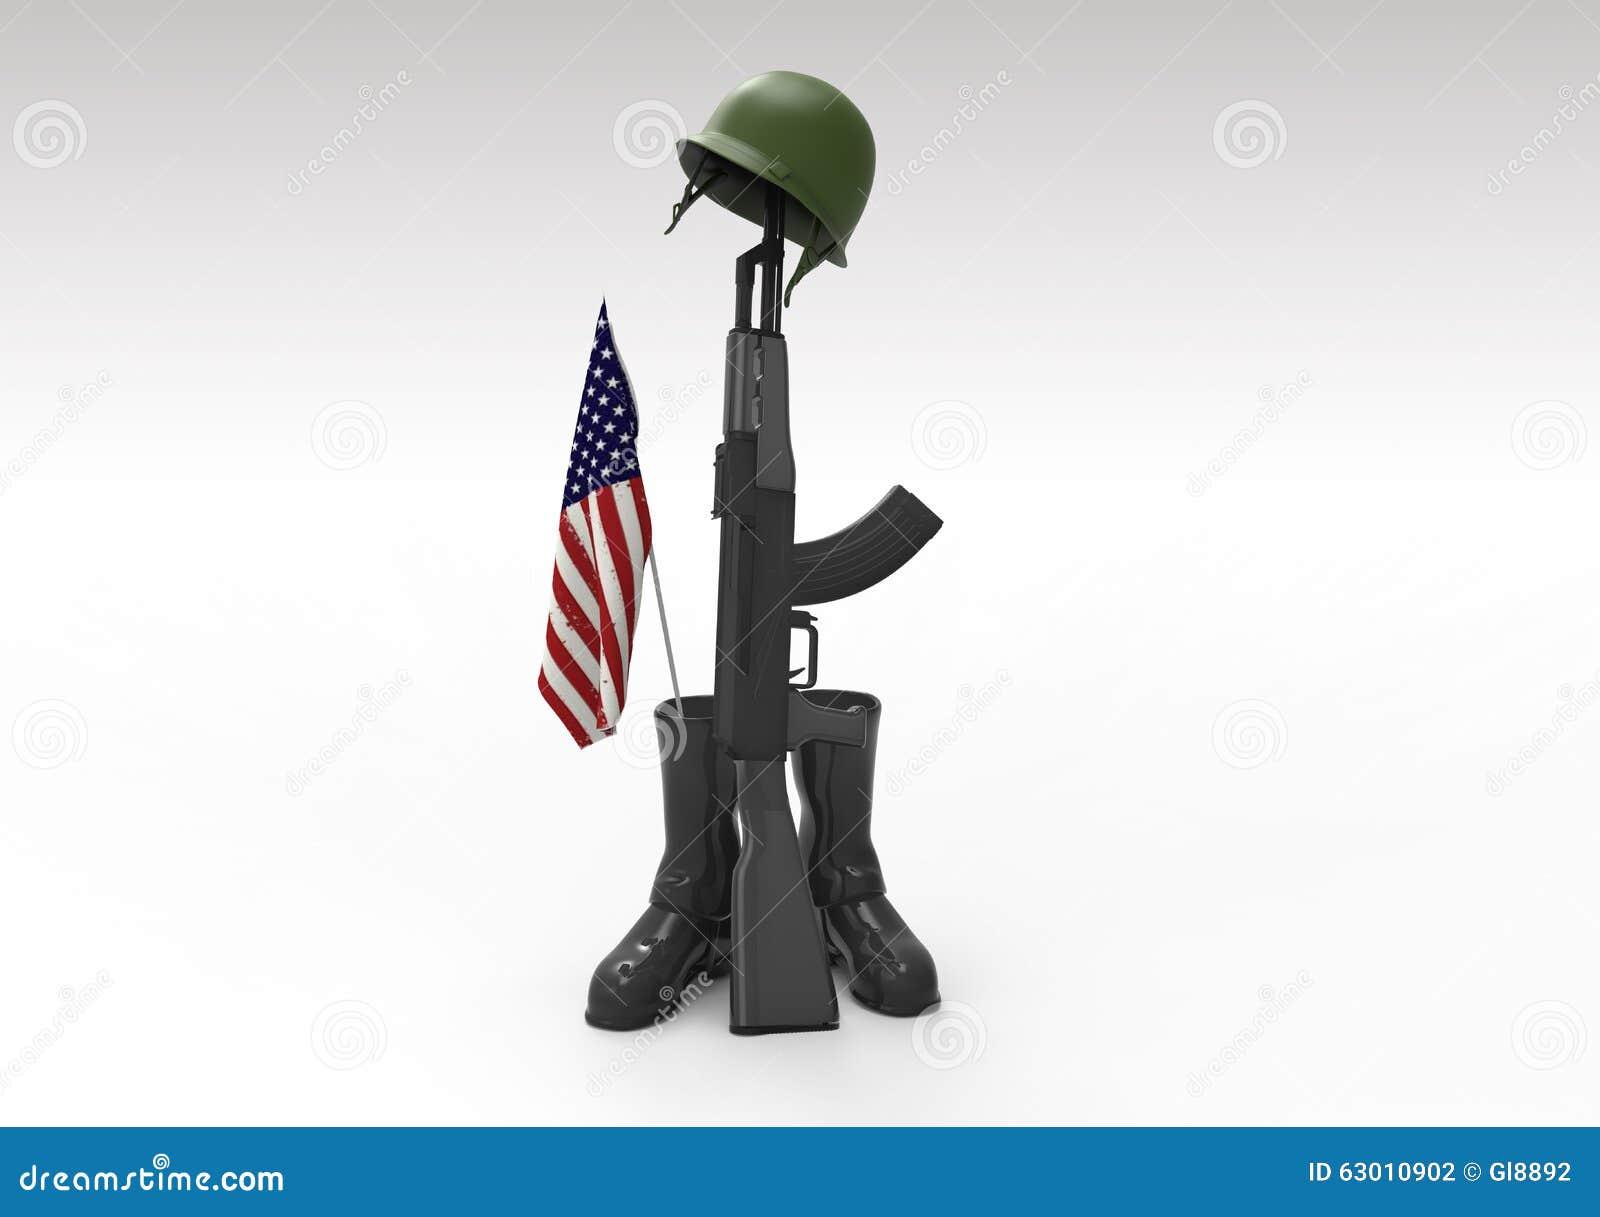 Veterans day symbol stock illustration illustration of destroy veterans day symbol biocorpaavc